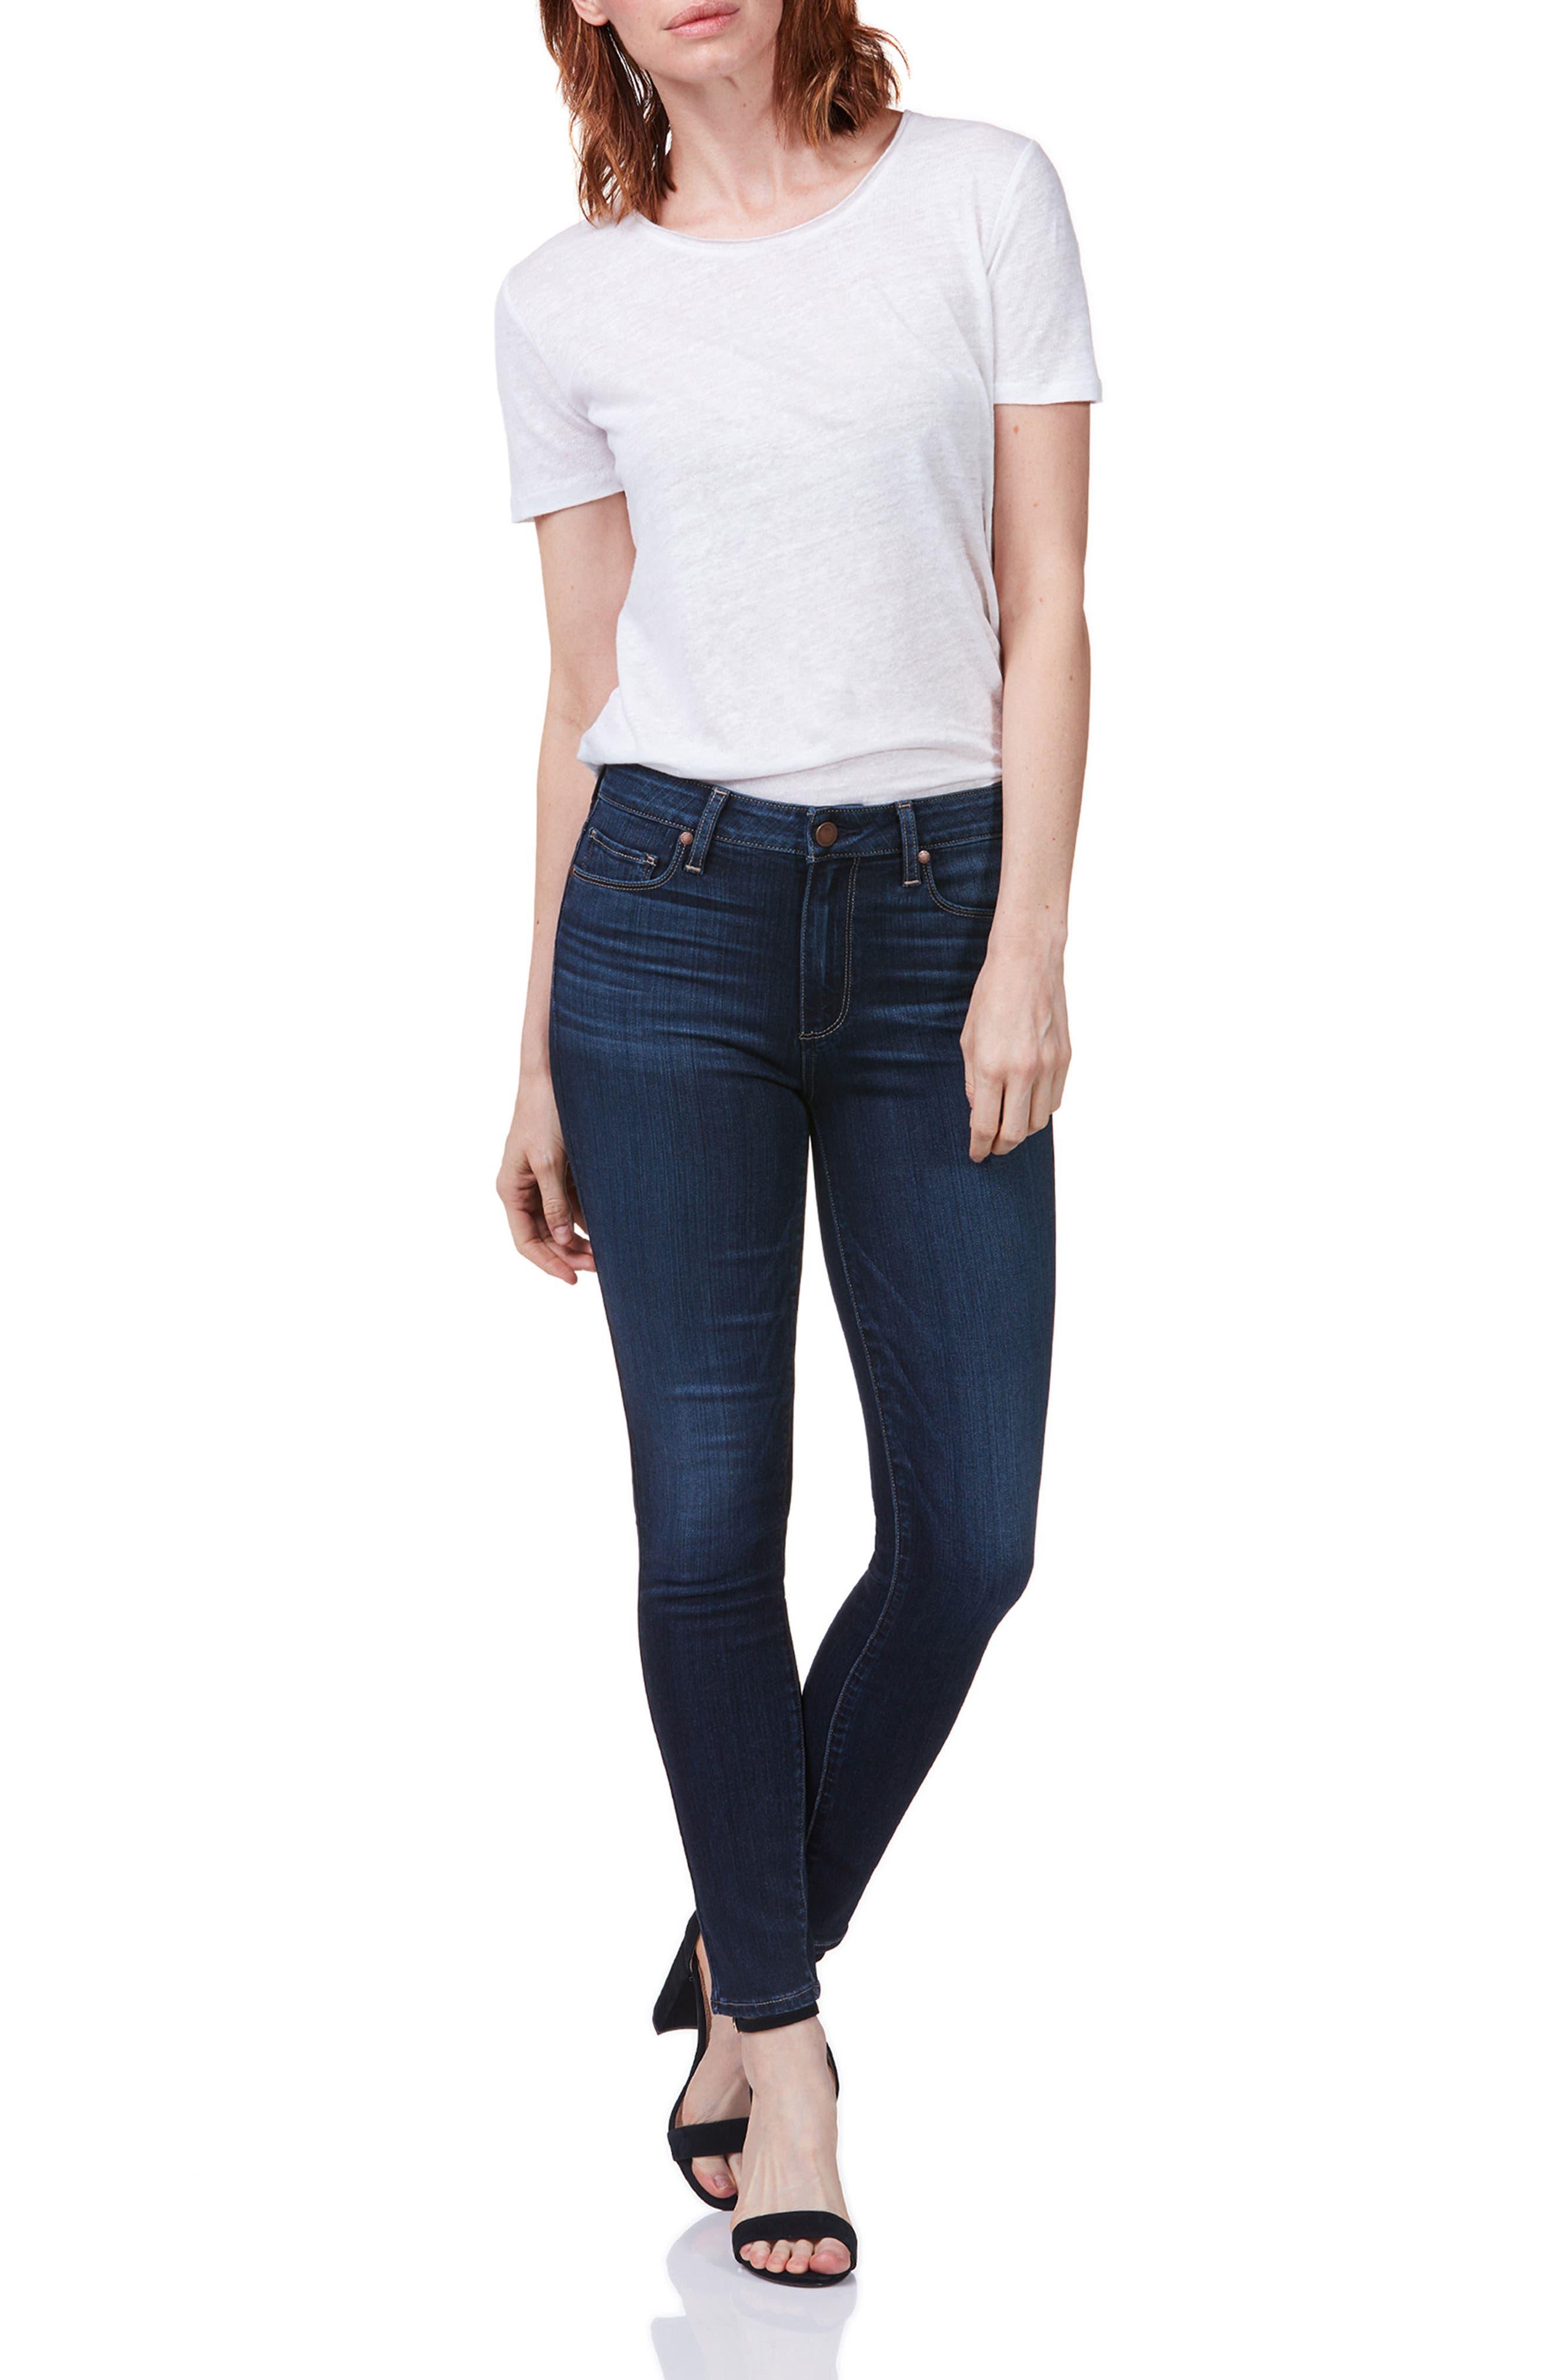 Hoxton High Waist Ultra Skinny Jeans,                             Alternate thumbnail 3, color,                             400